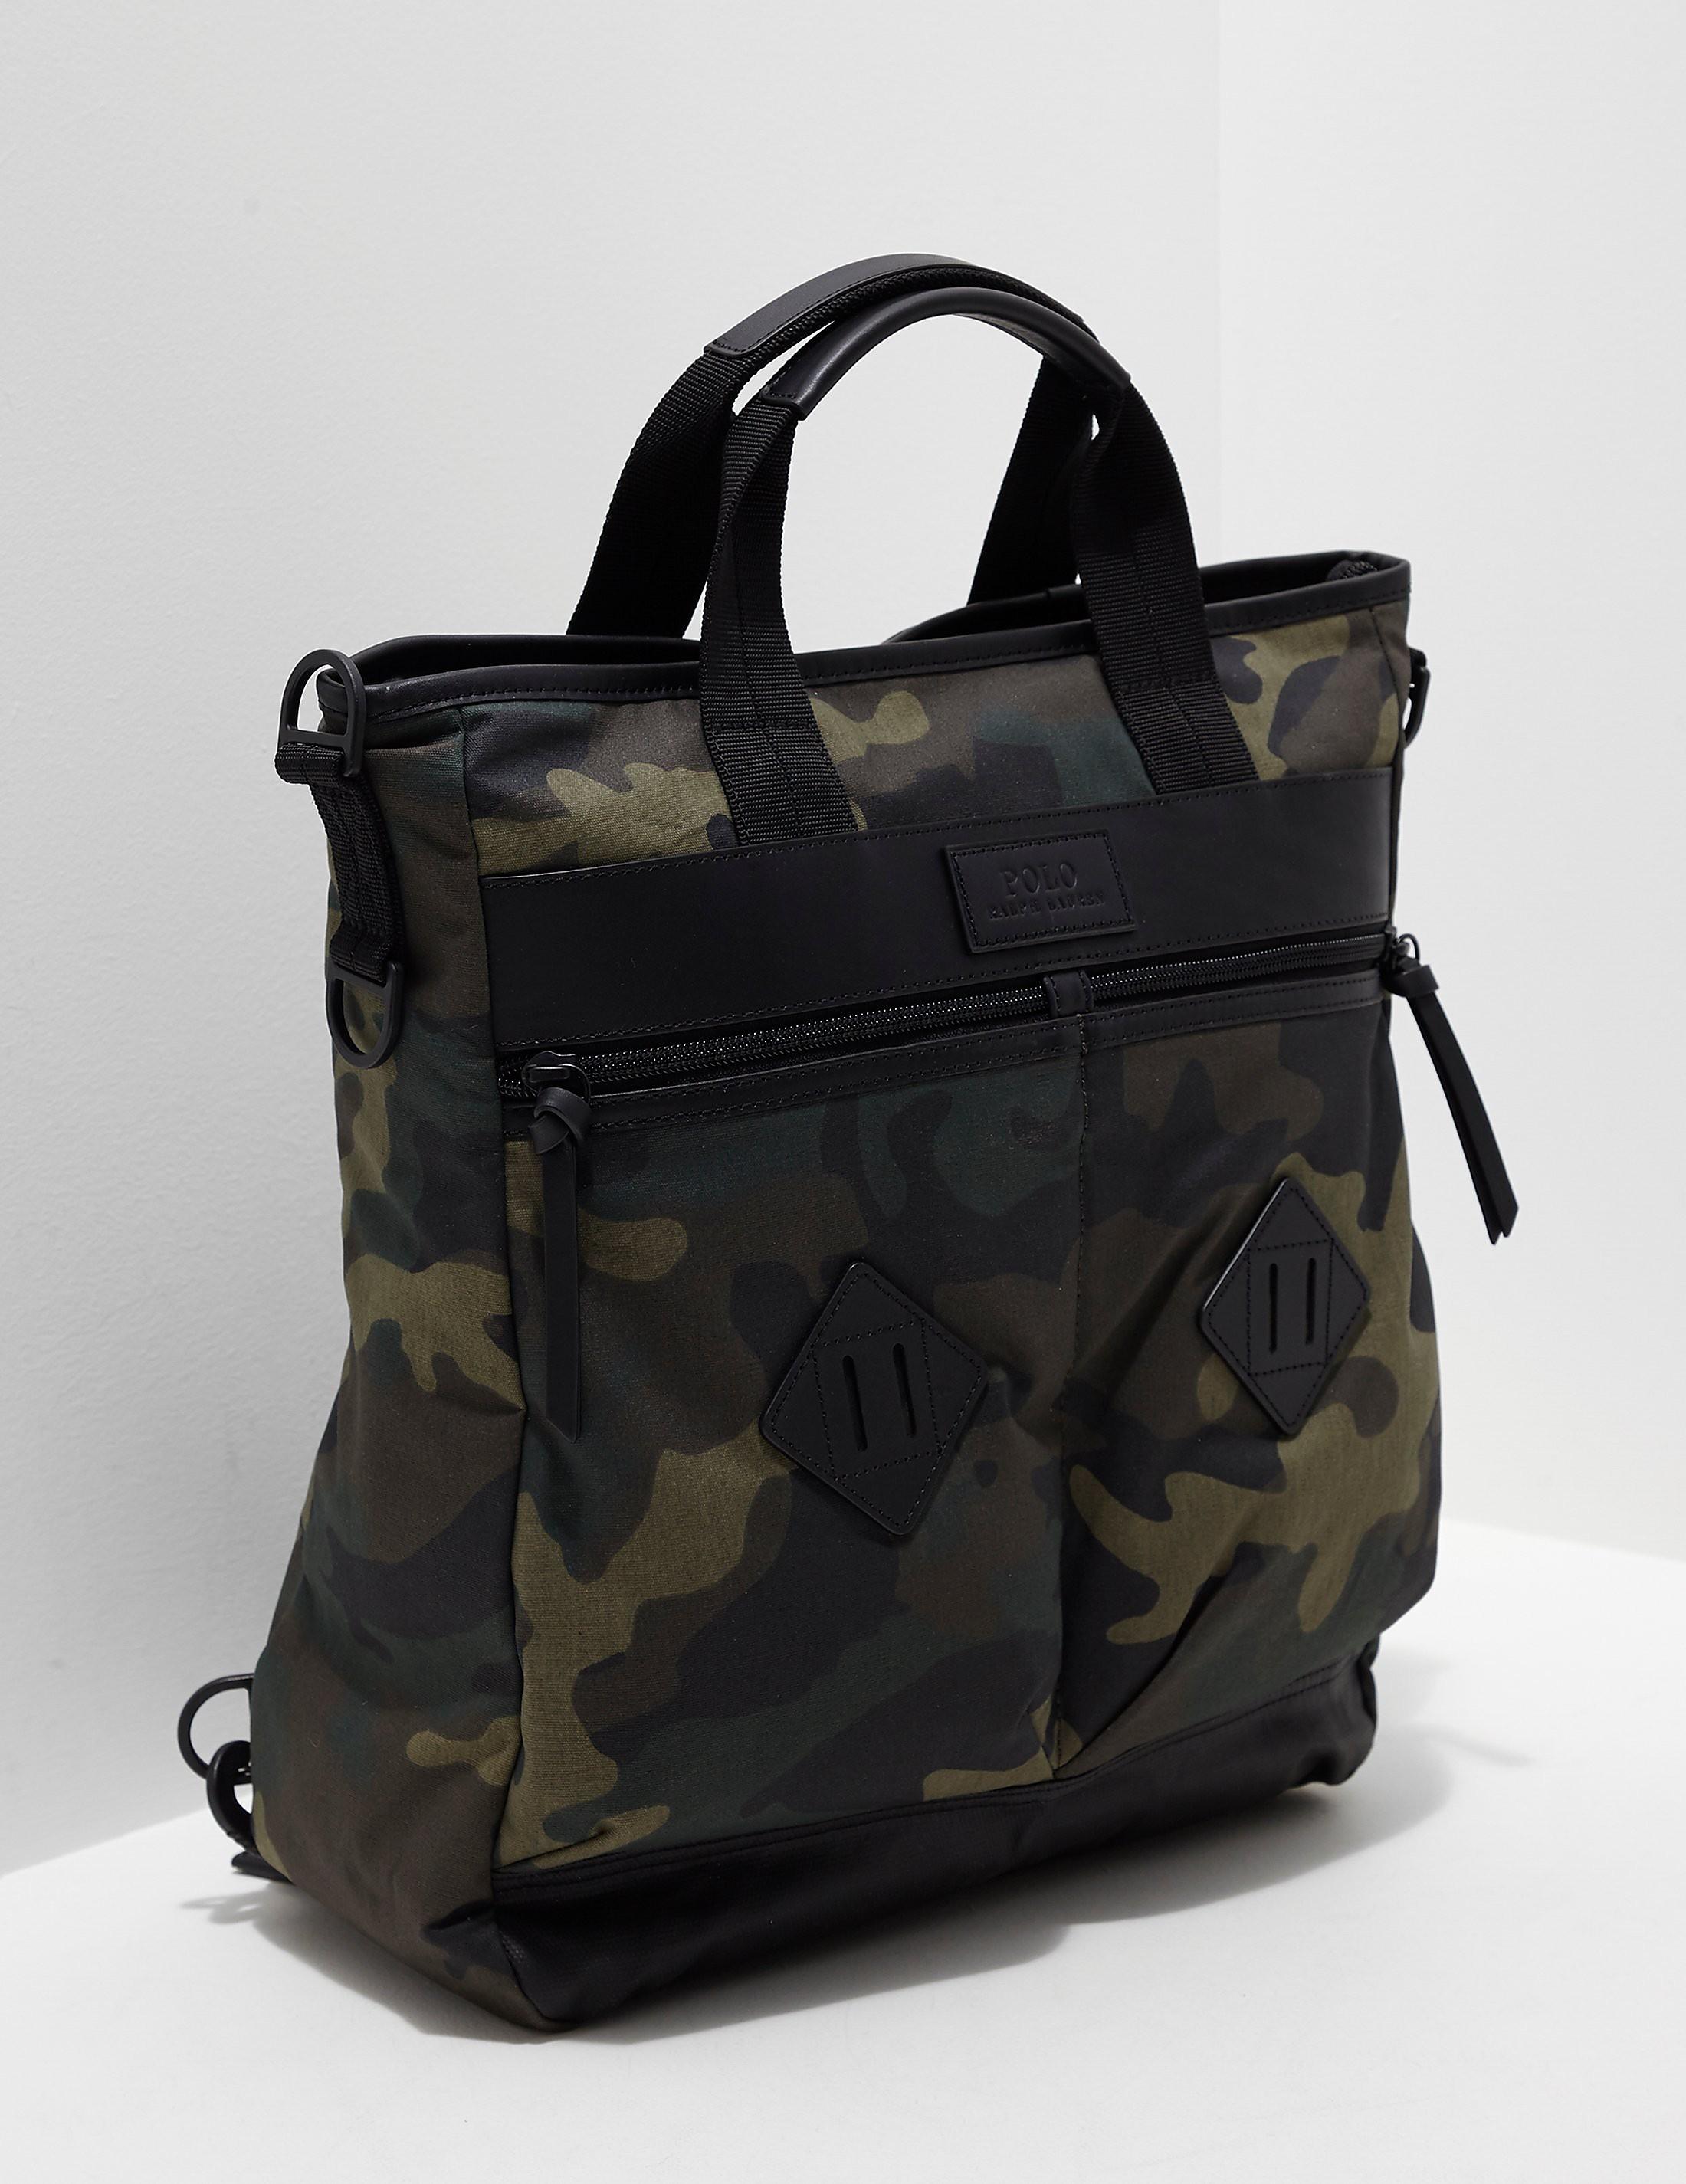 Polo Ralph Lauren Tote Bag